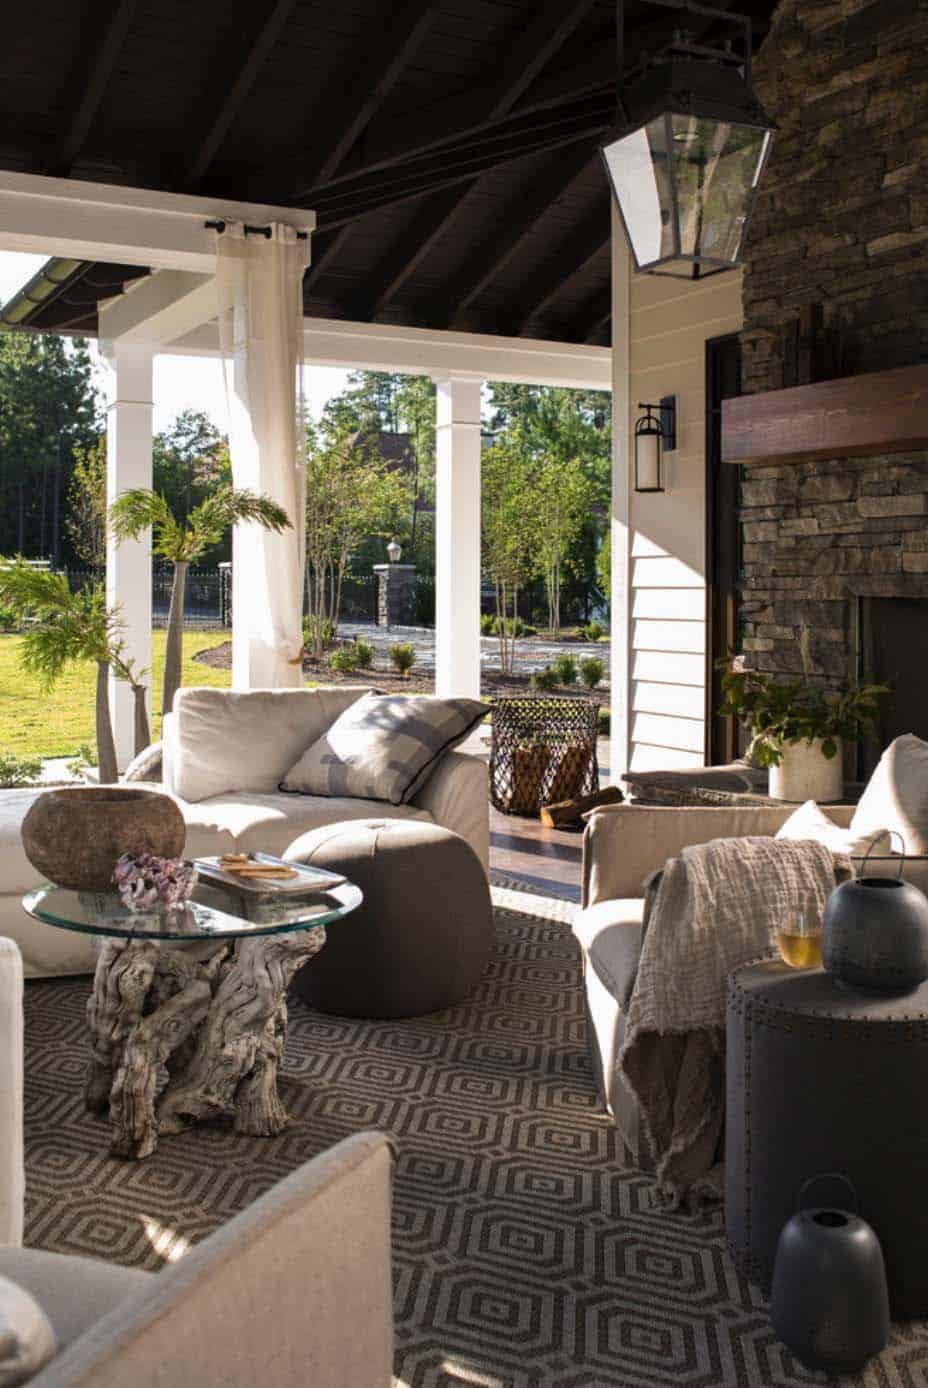 lakeside-weekend-retreat-heather-garrett-design-17-1-kindesign